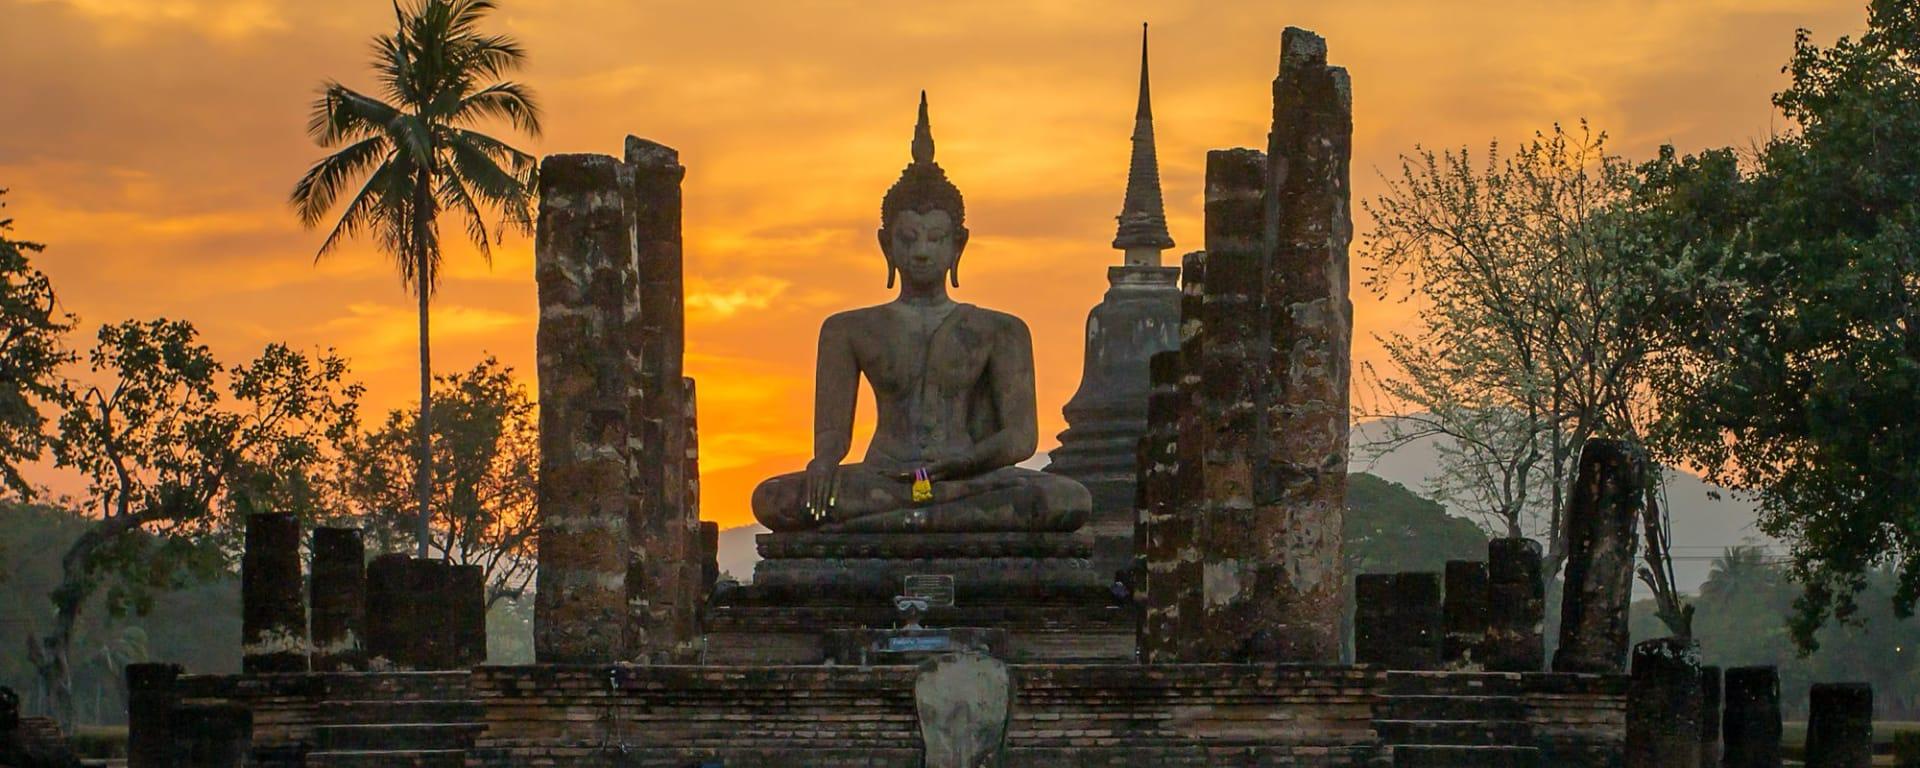 Höhepunkte Thailands ab Bangkok: Sukhothai: Buddha statue in Wat Mahathat temple